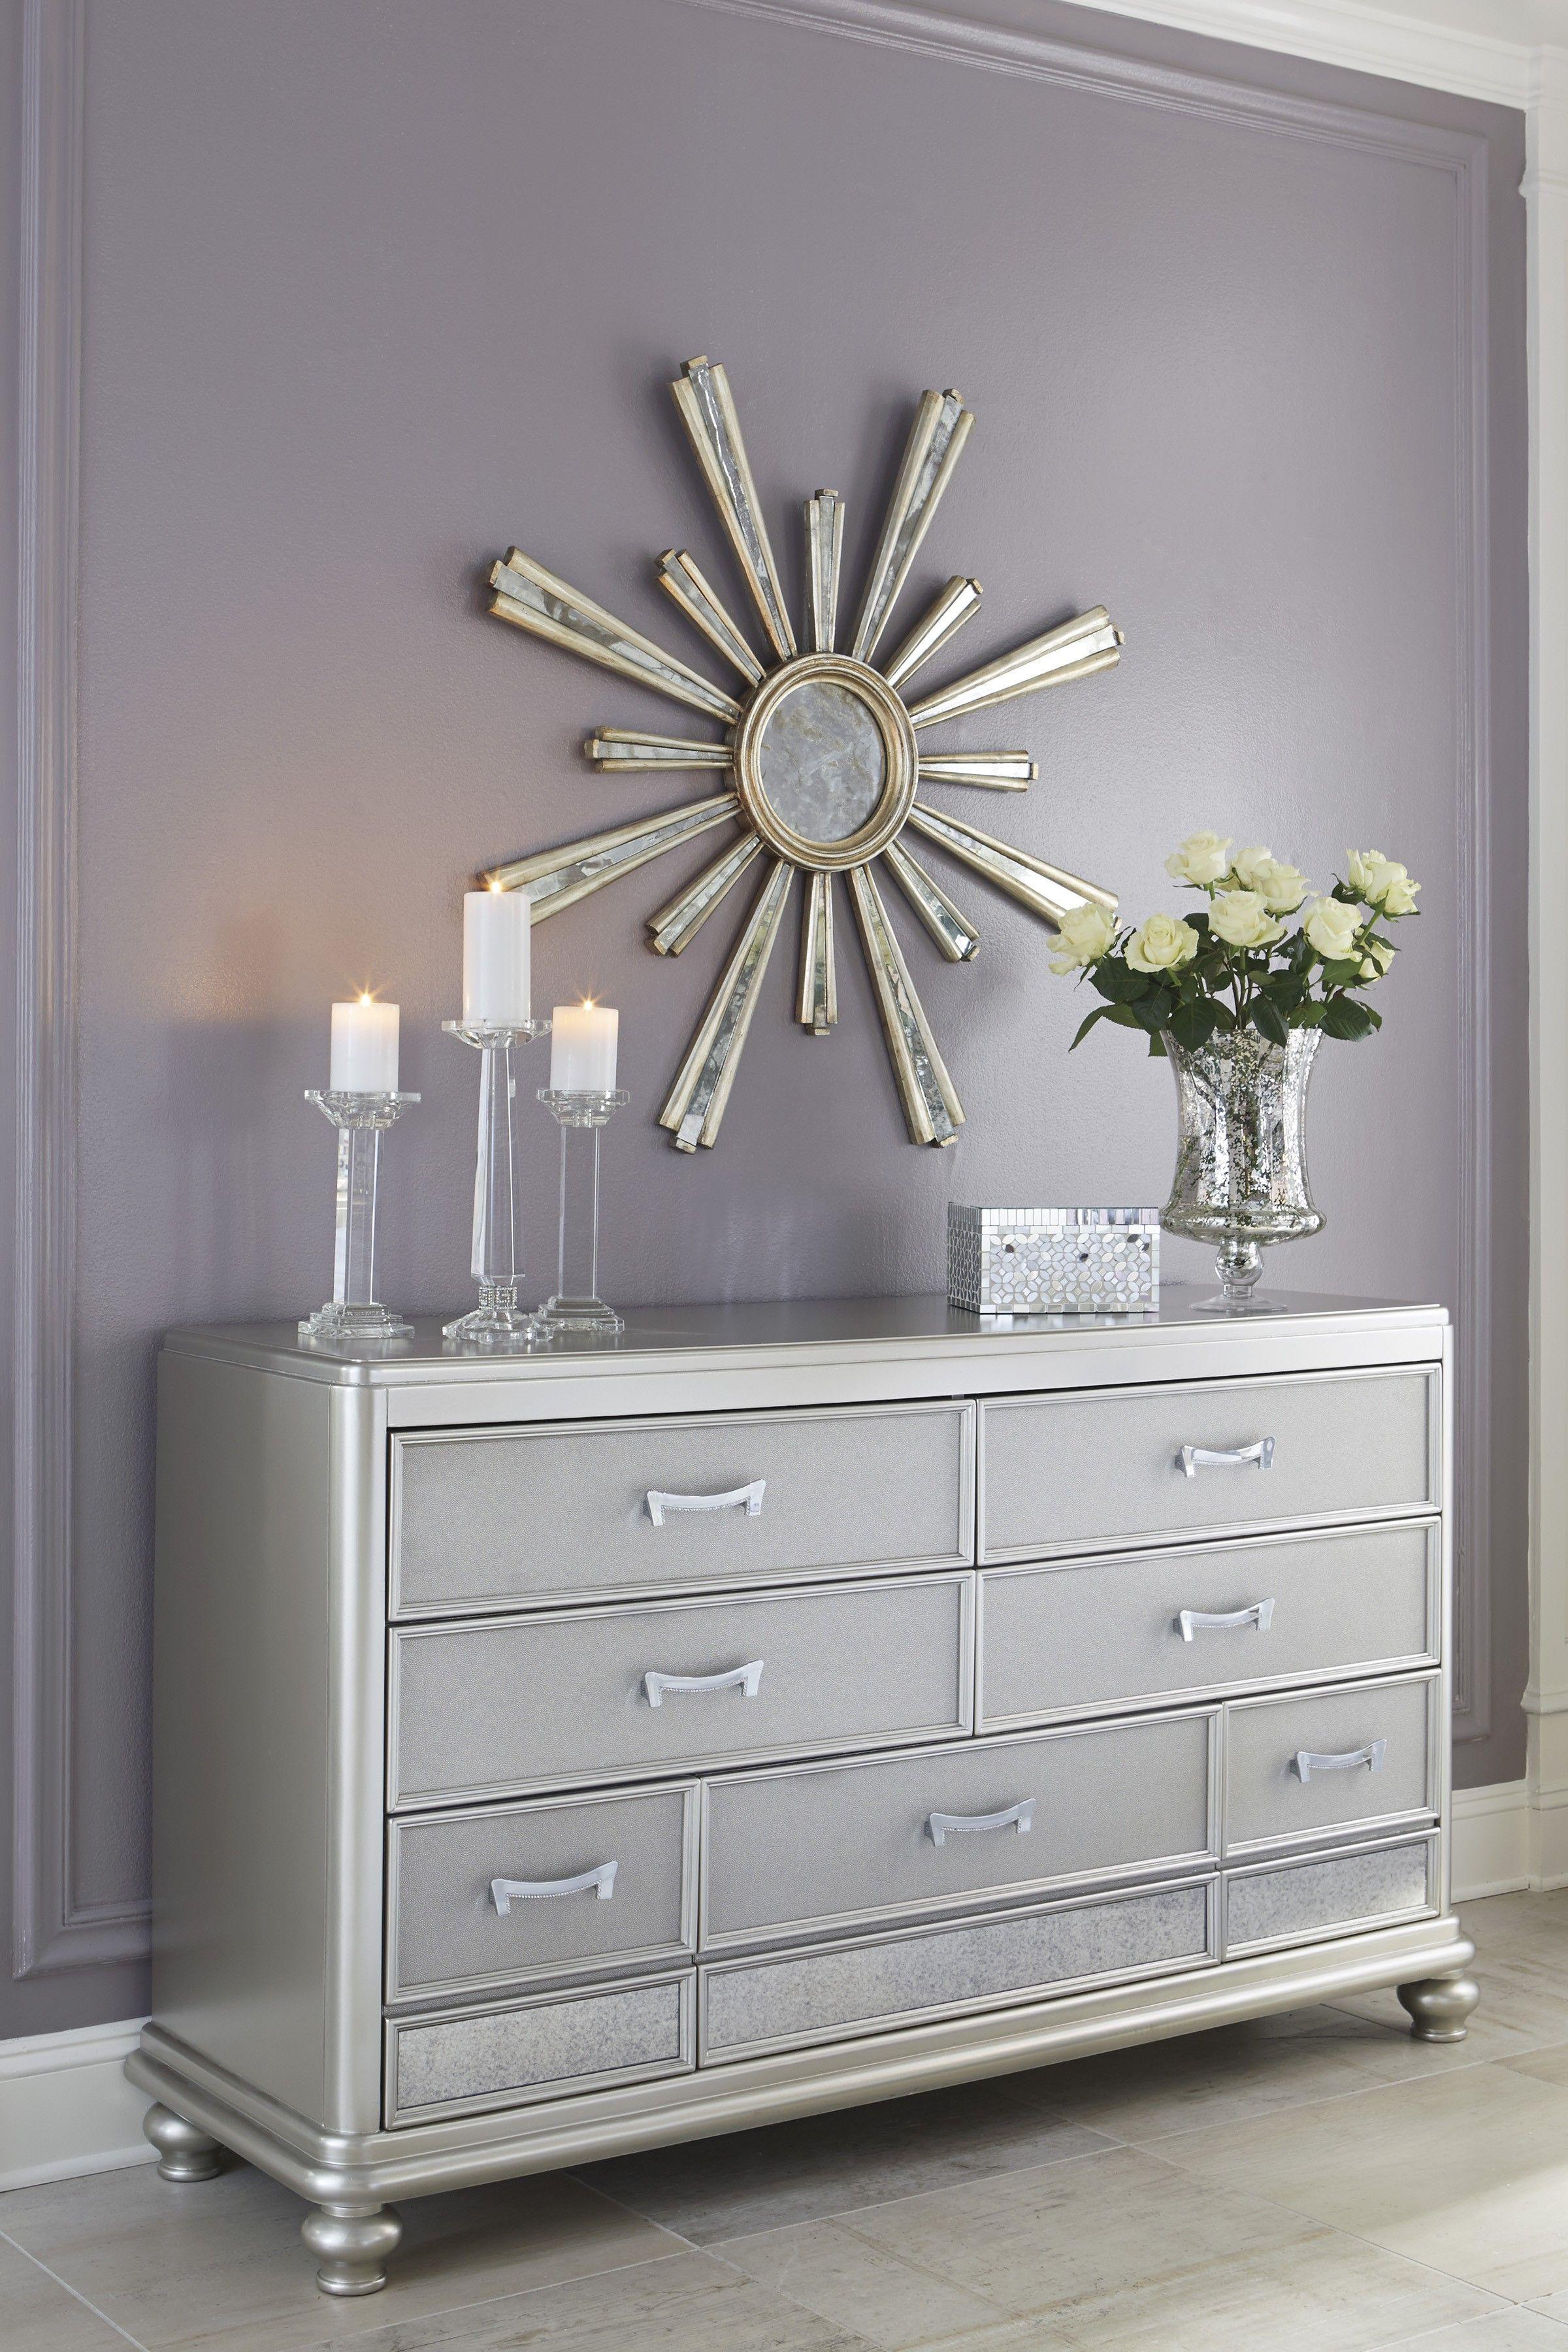 Pin On Silver Interior Design Inspirations